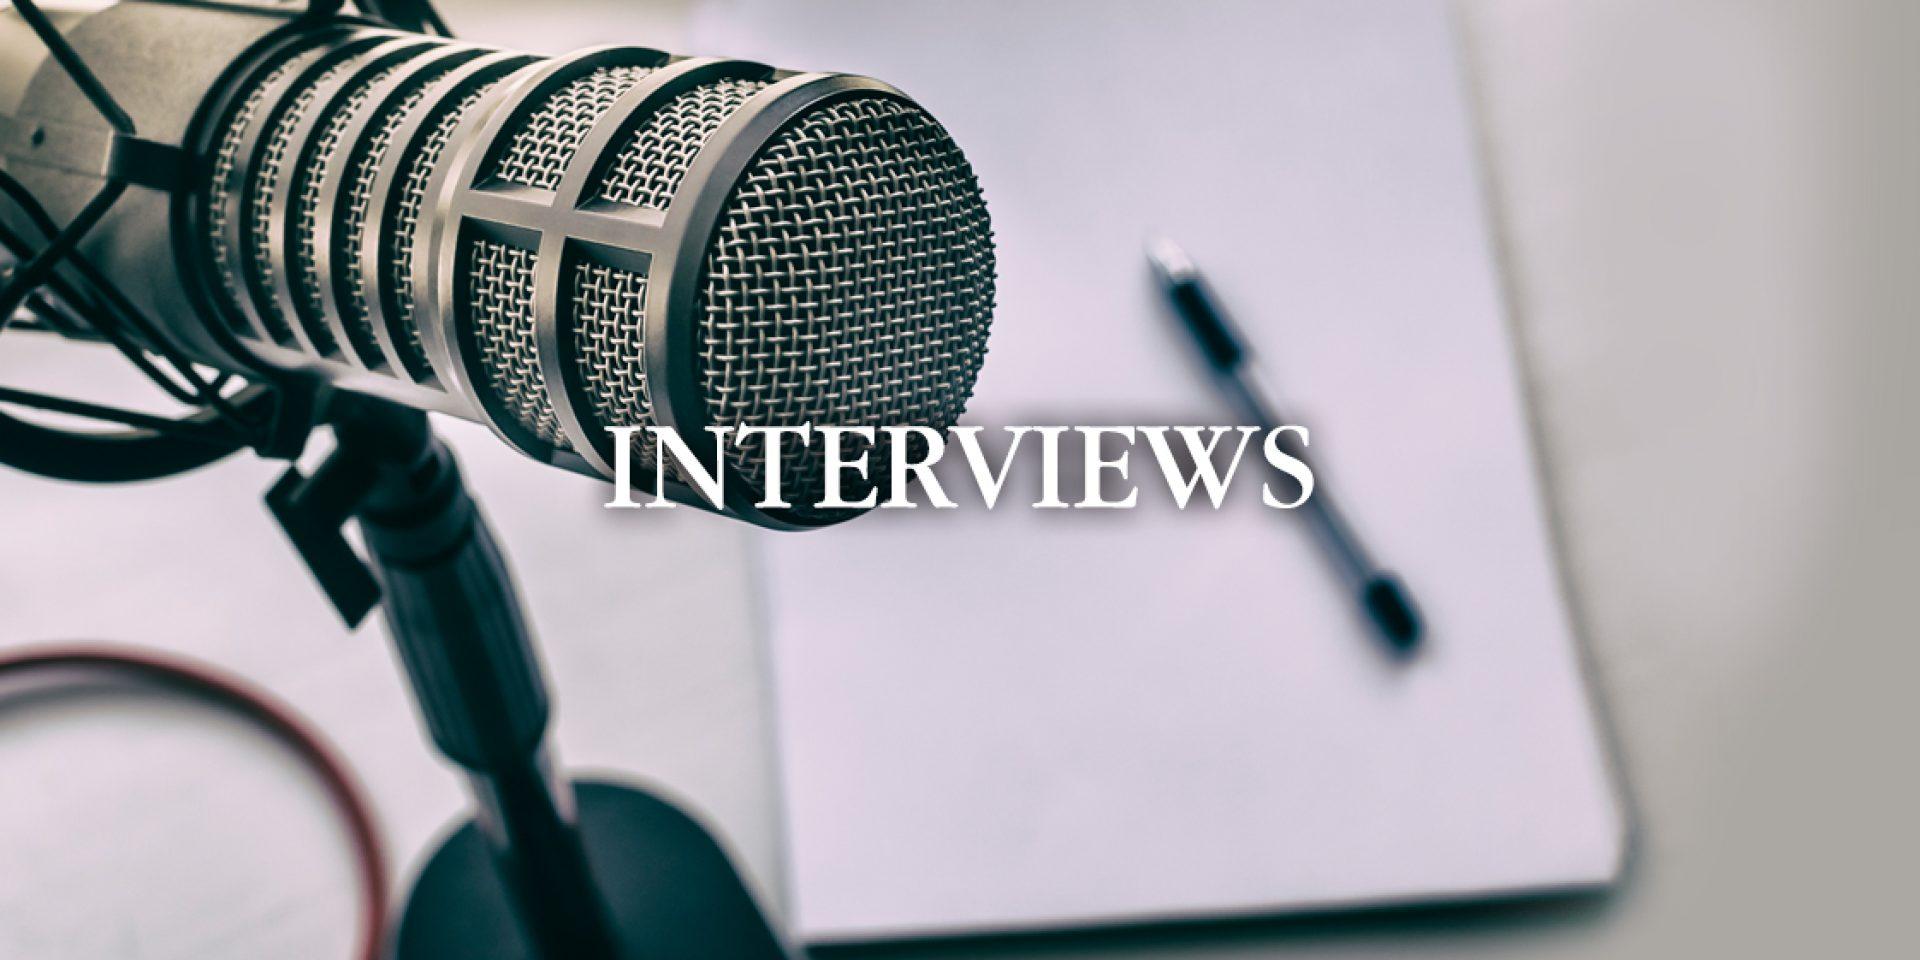 J.Stern_.Interviews1